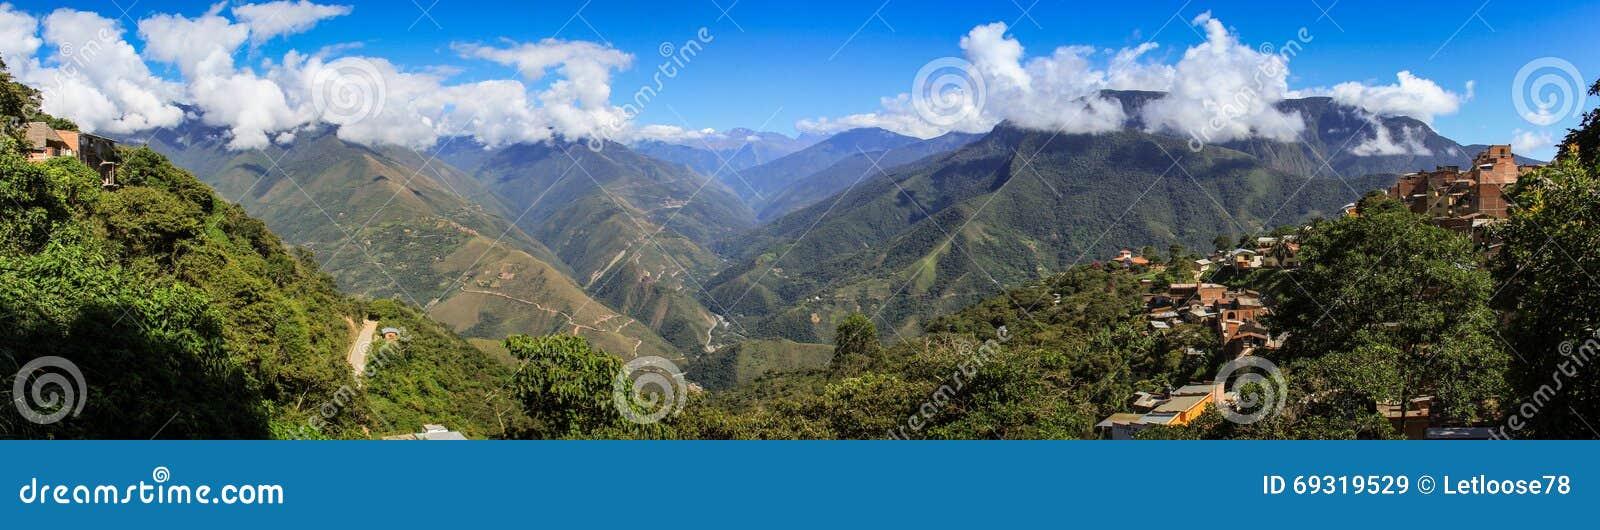 Vista panorâmica de Coroico, Yungas, Bolívia